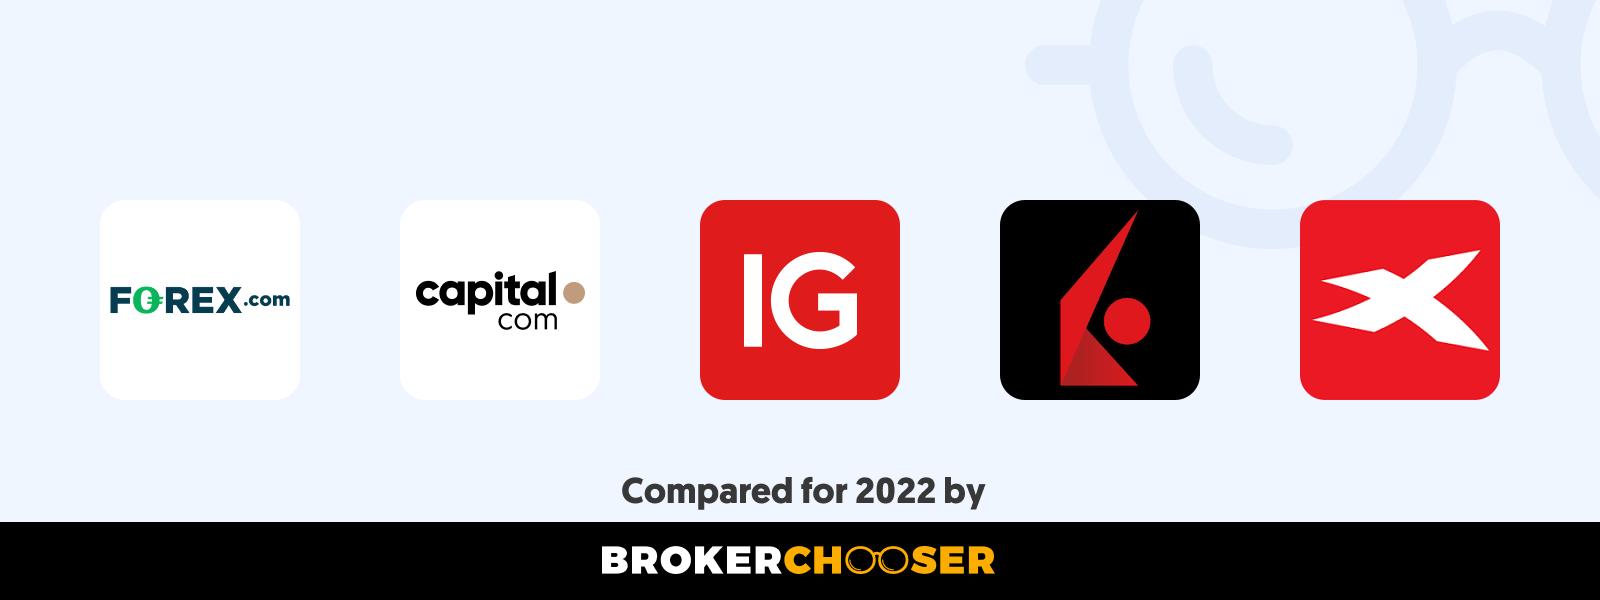 Best forex brokers for beginners in Mongolia in 2021